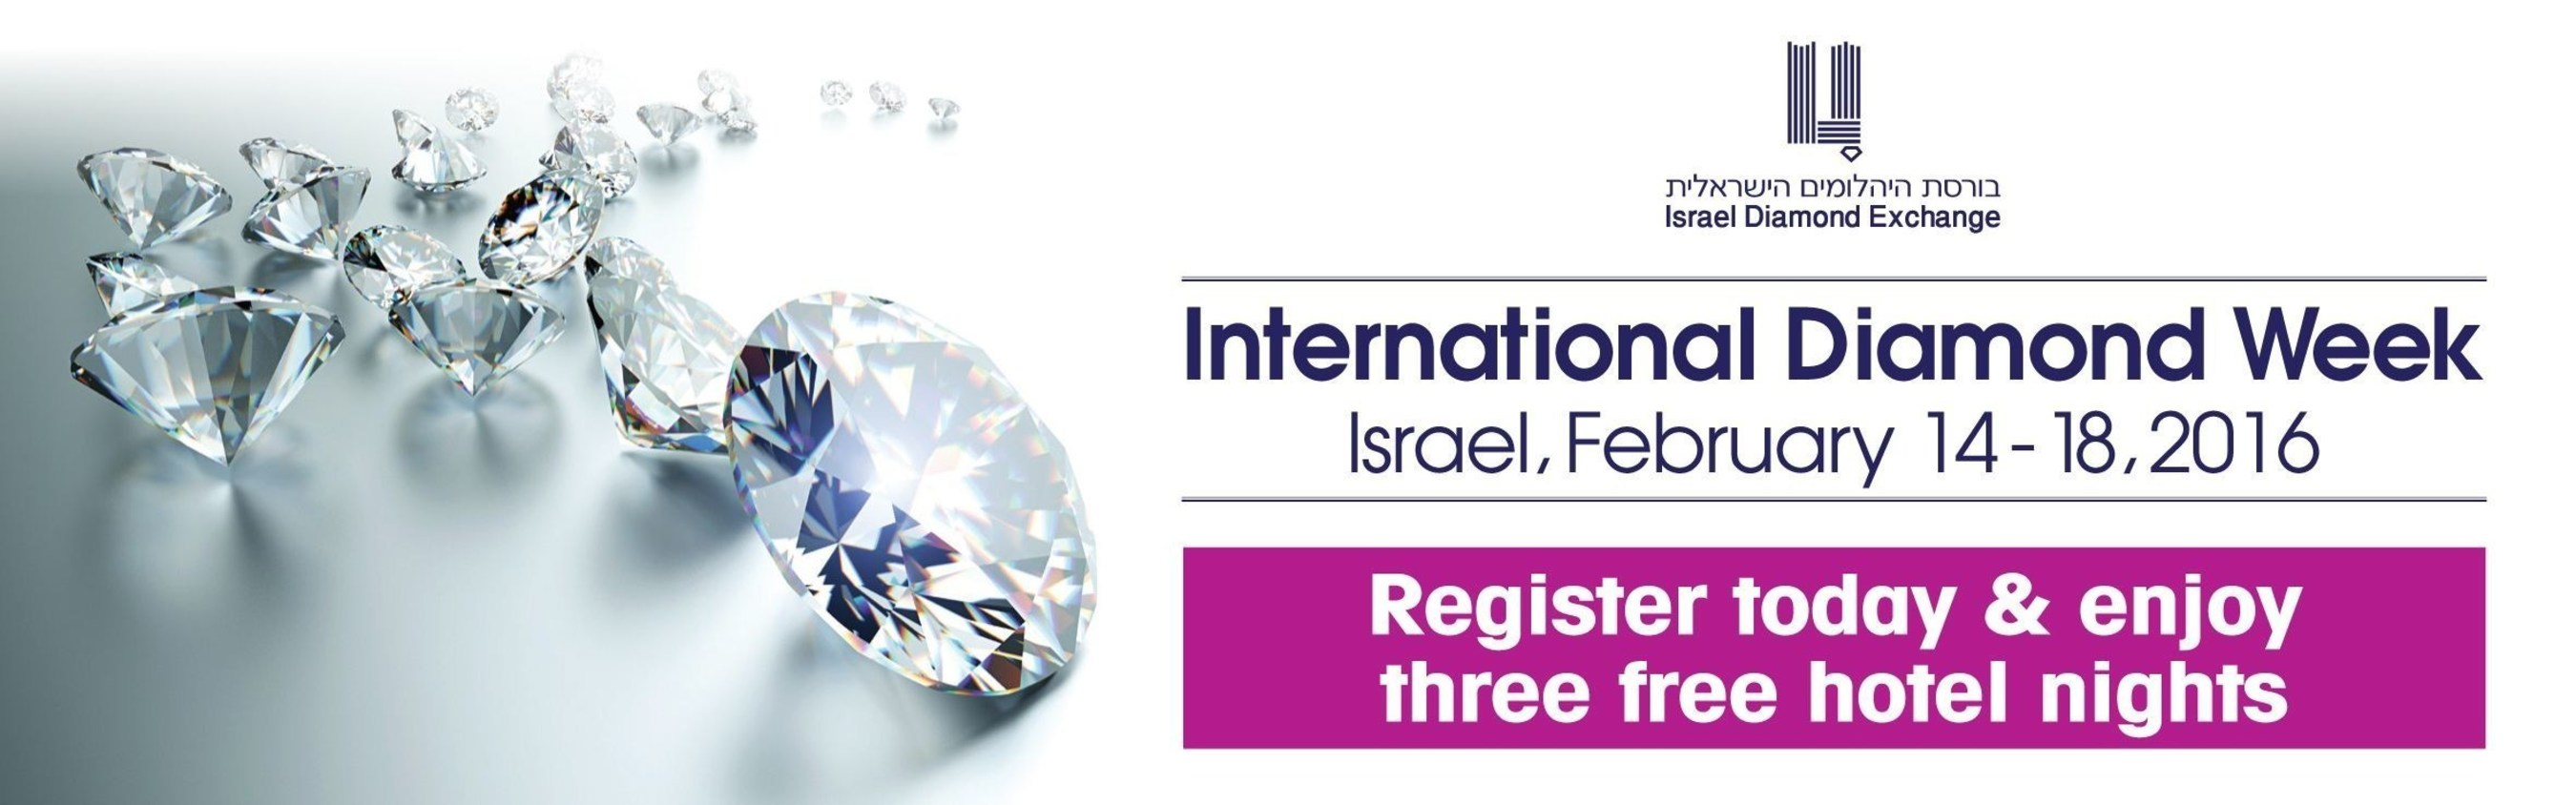 http://www.en.isde.co.il/form.aspx?id=29286 (PRNewsFoto/The Israel Diamond Exchange) (PRNewsFoto/The Israel Diamond Exchange)